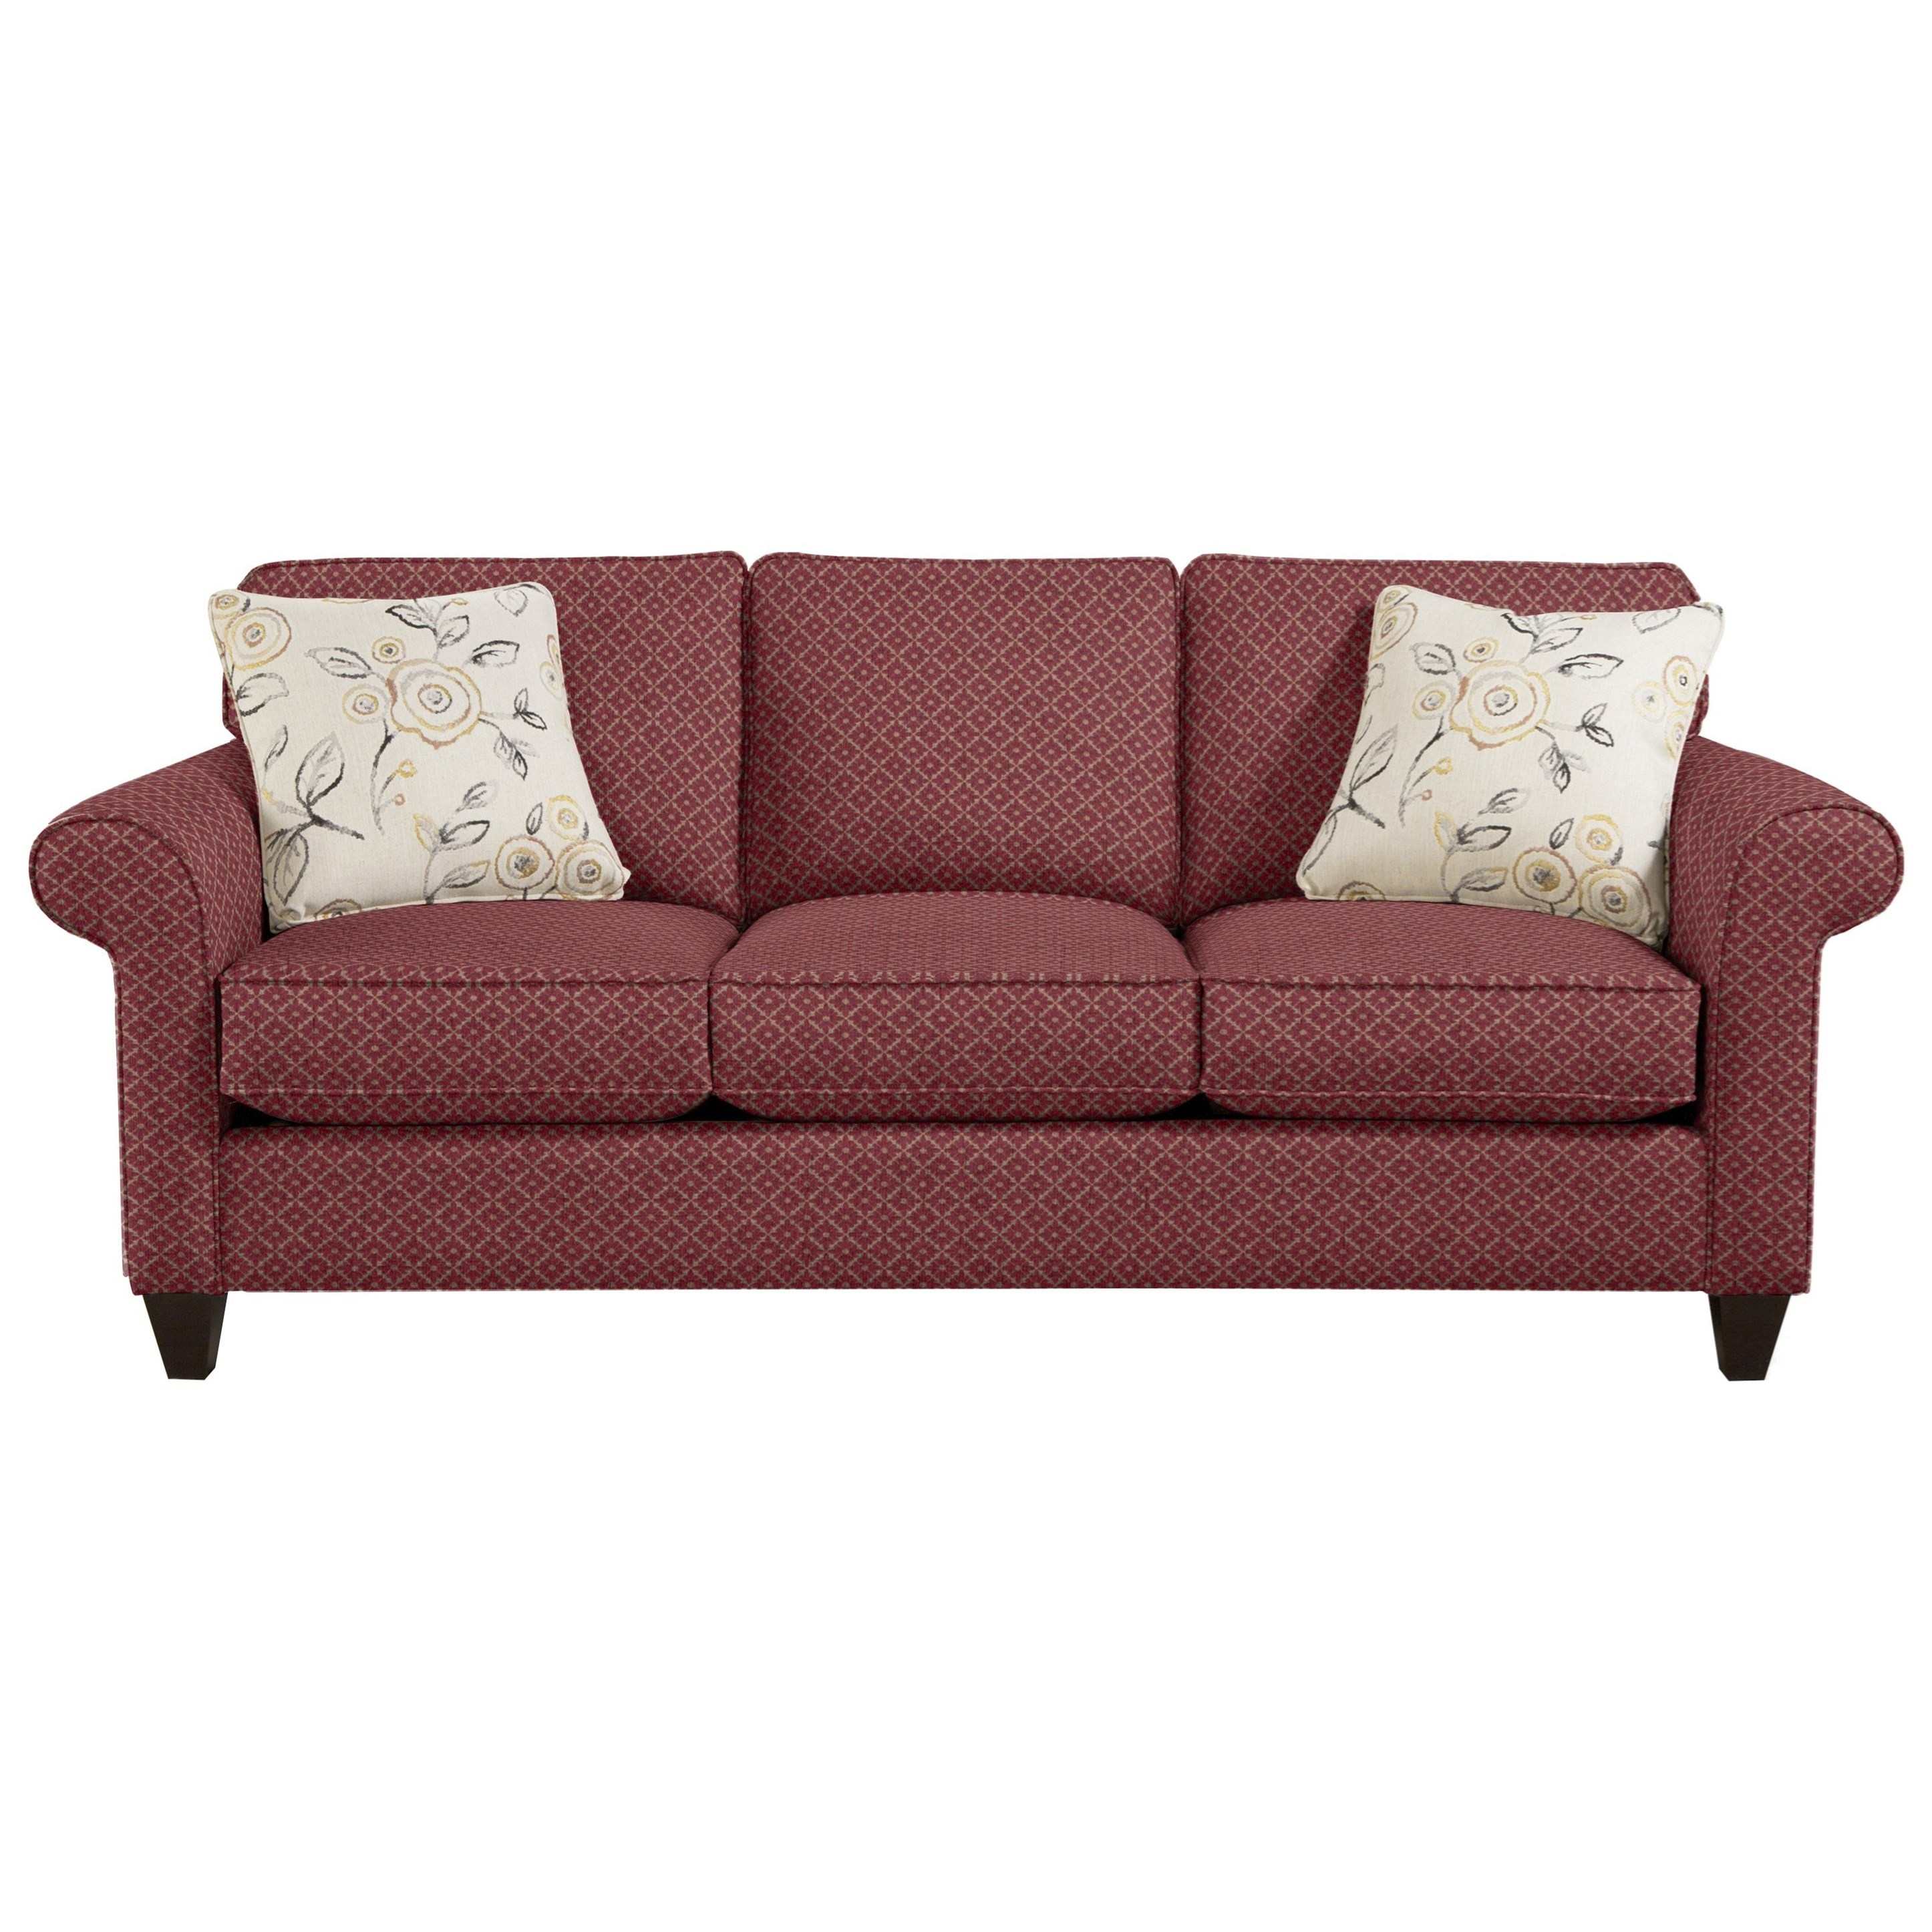 7421 Sofa by Craftmaster at Story & Lee Furniture